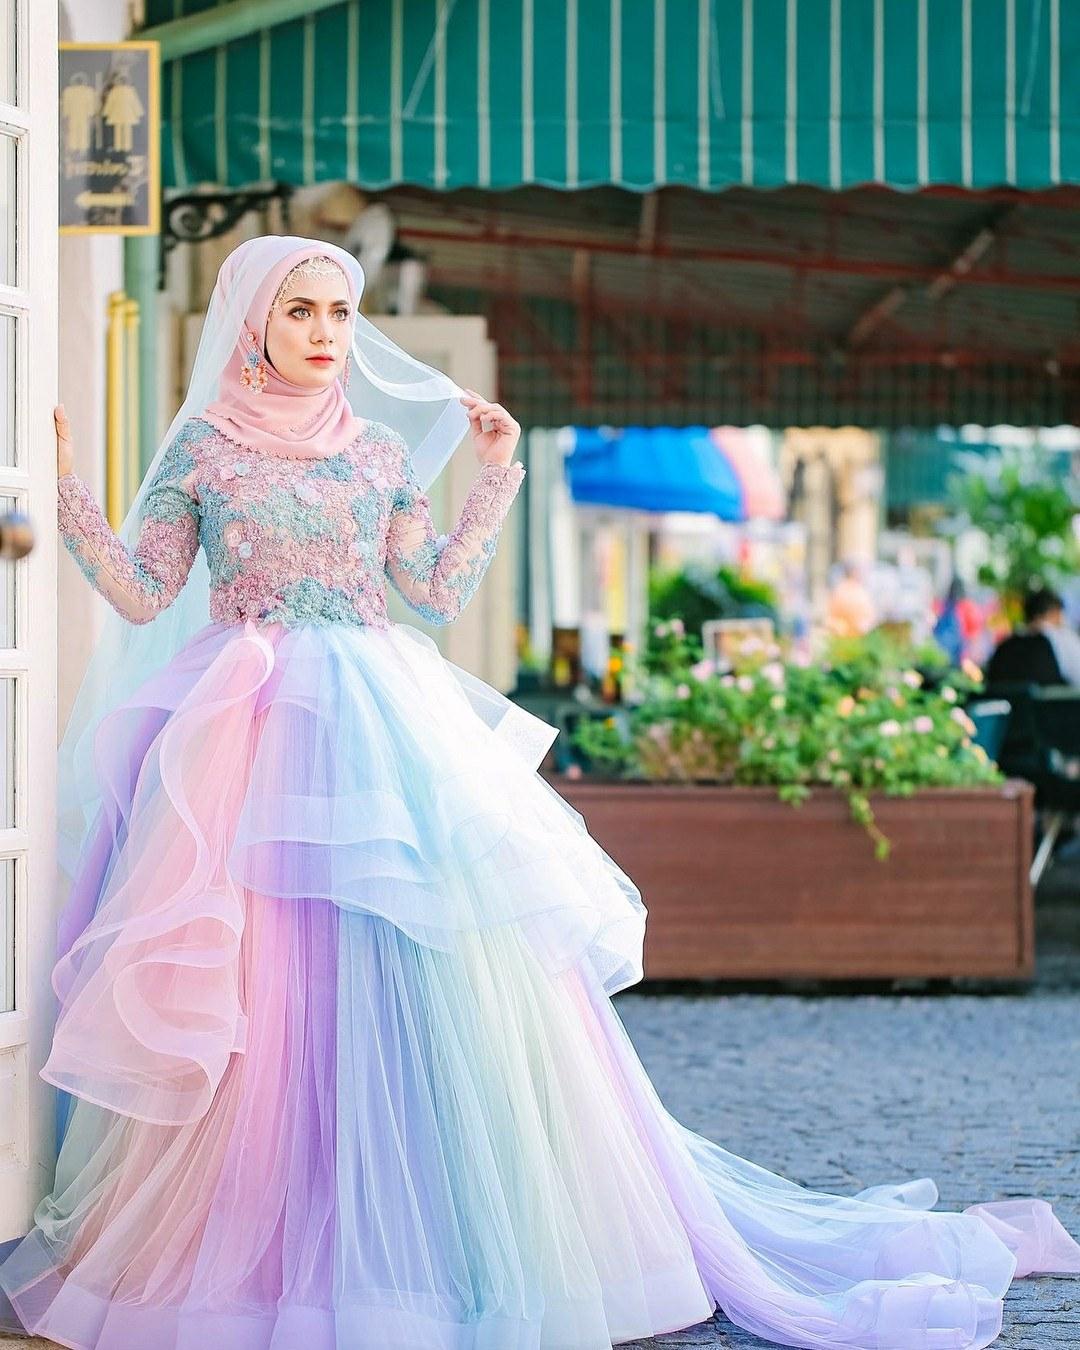 Ide Baju Pengantin Muslimah Thdr 34 Inspirasi Terpopuler Gaun Pengantin Malaysia